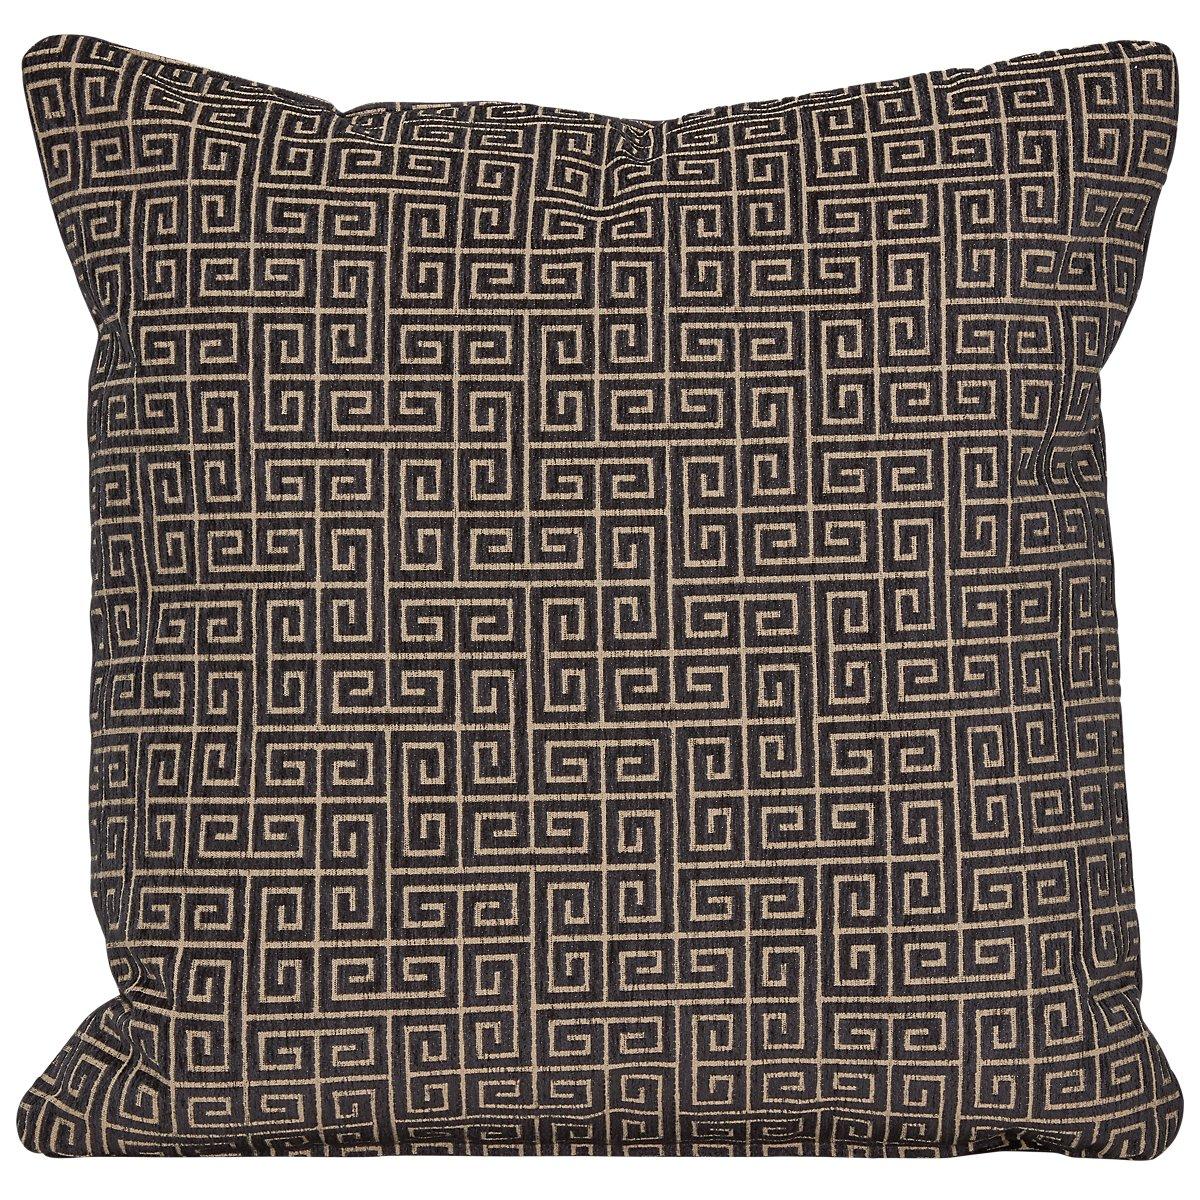 Keys Black Fabric Square Accent Pillow